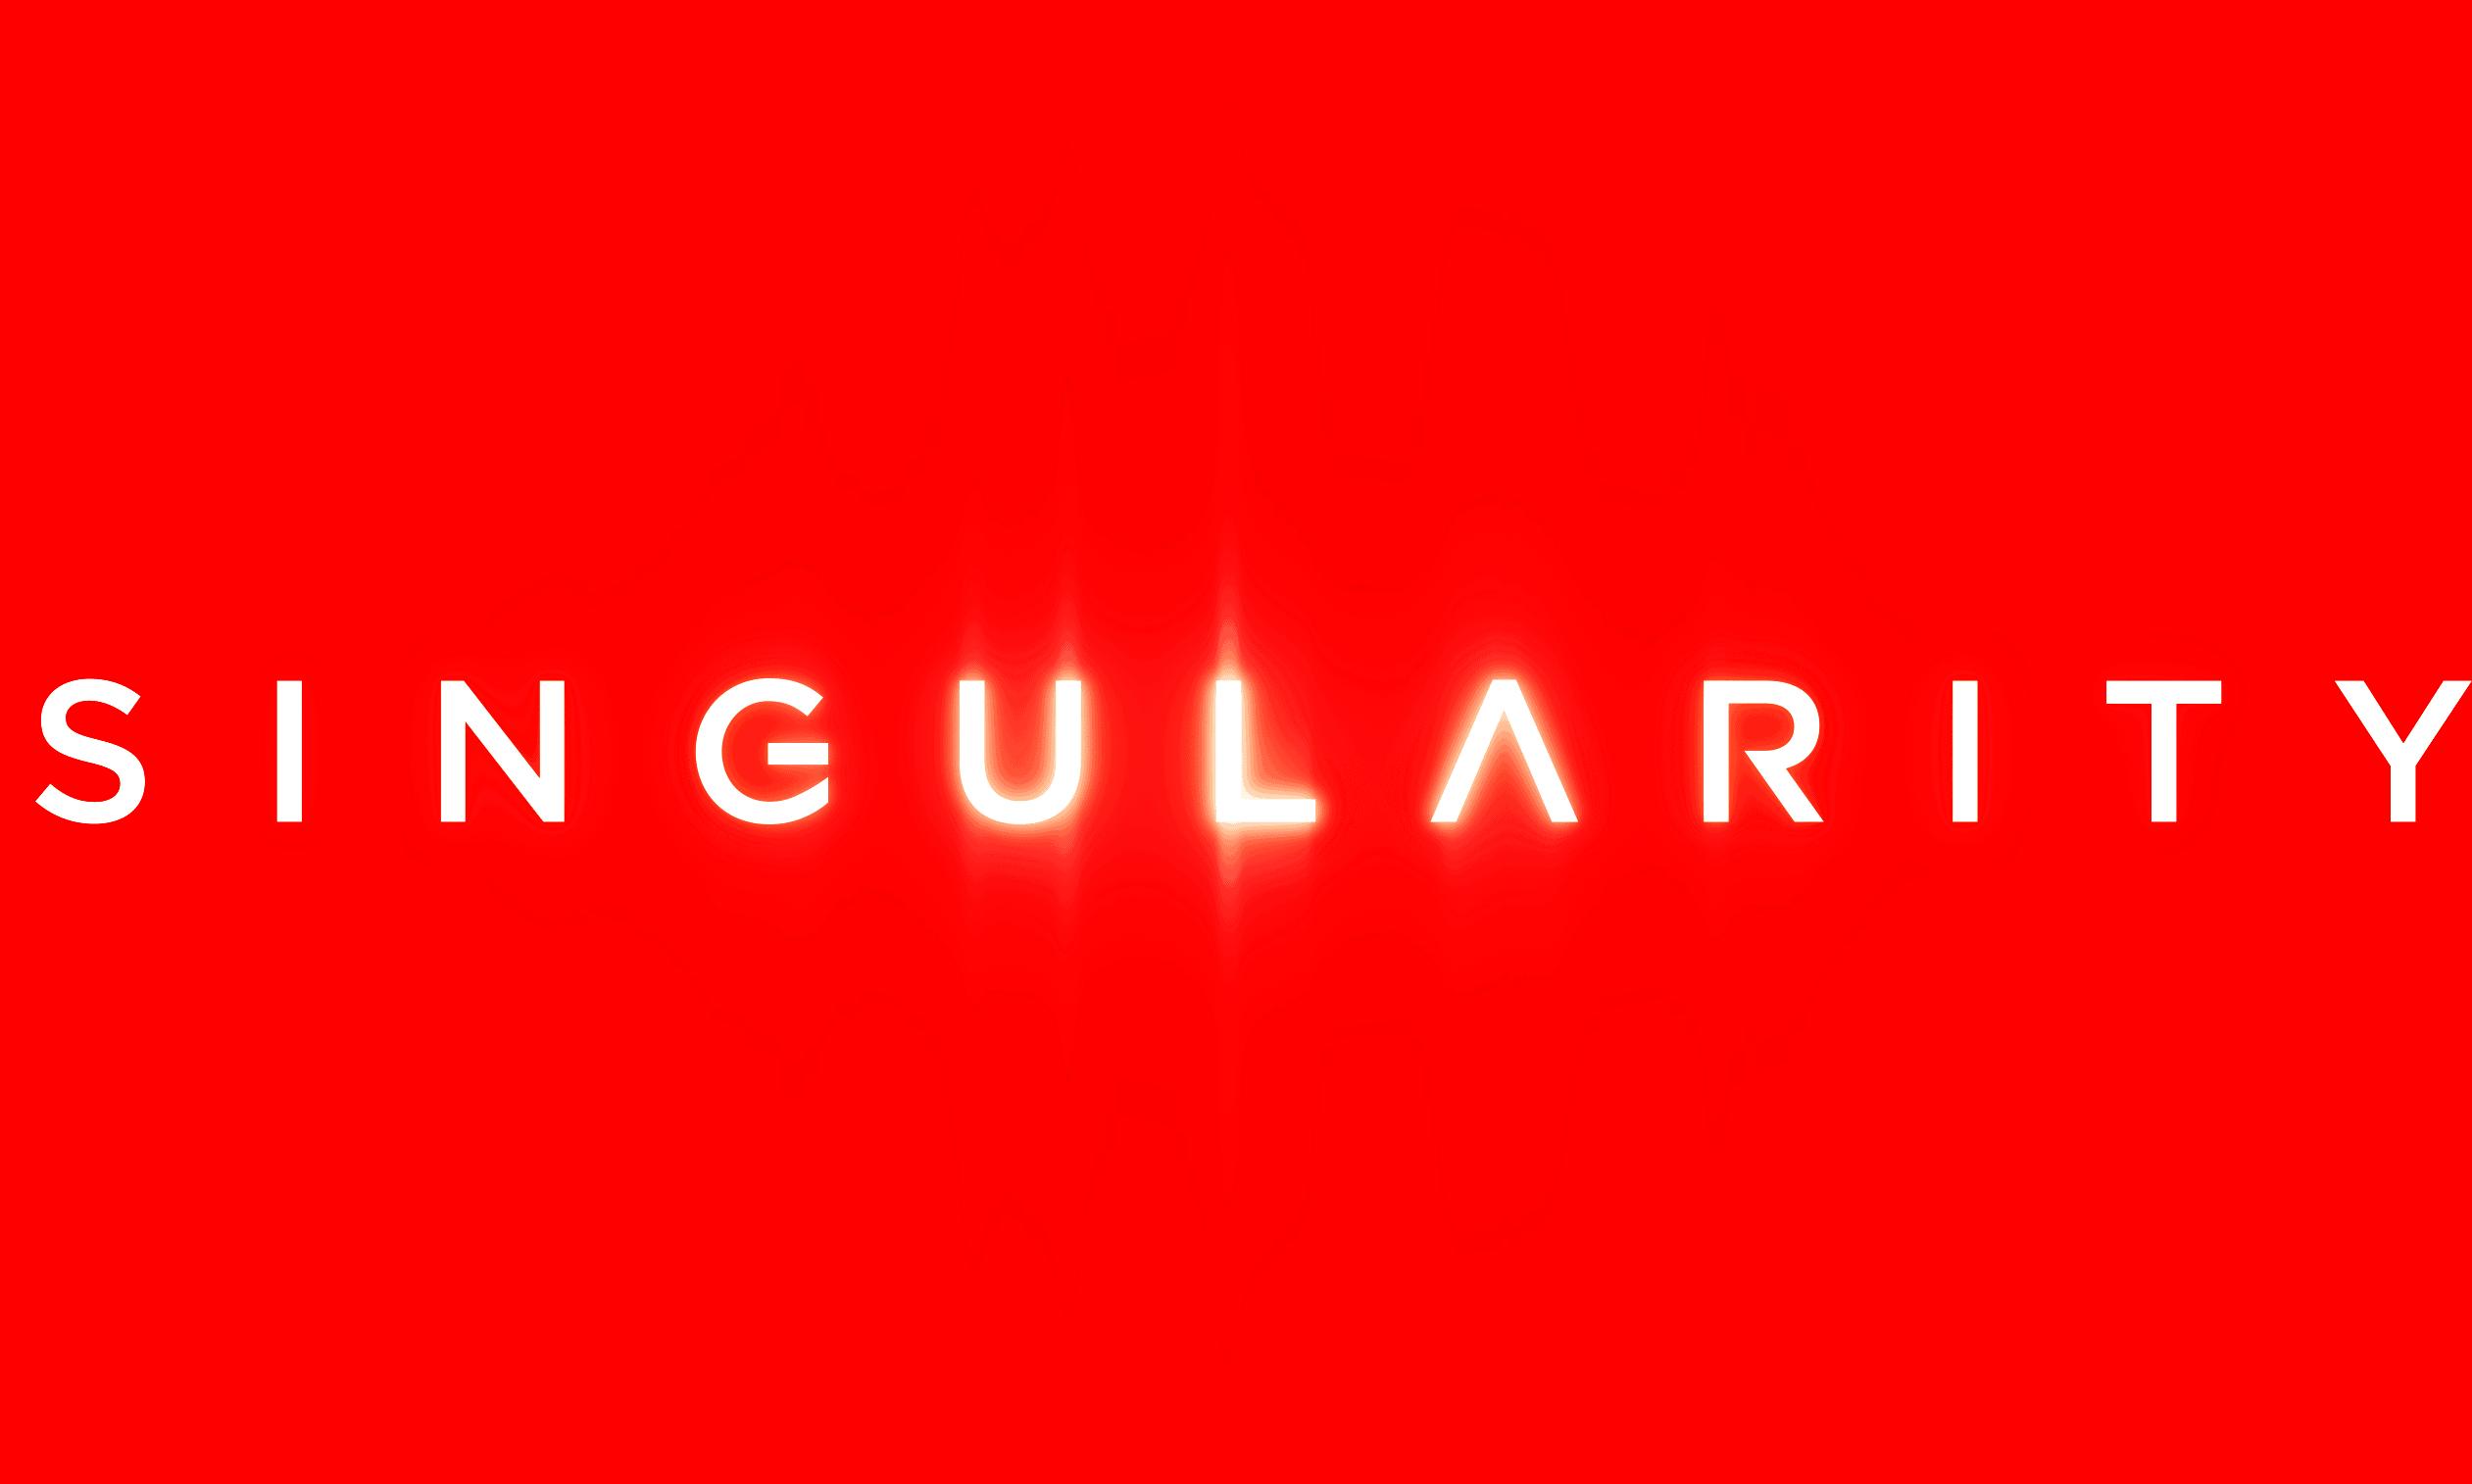 Singularity VR experience arena logo